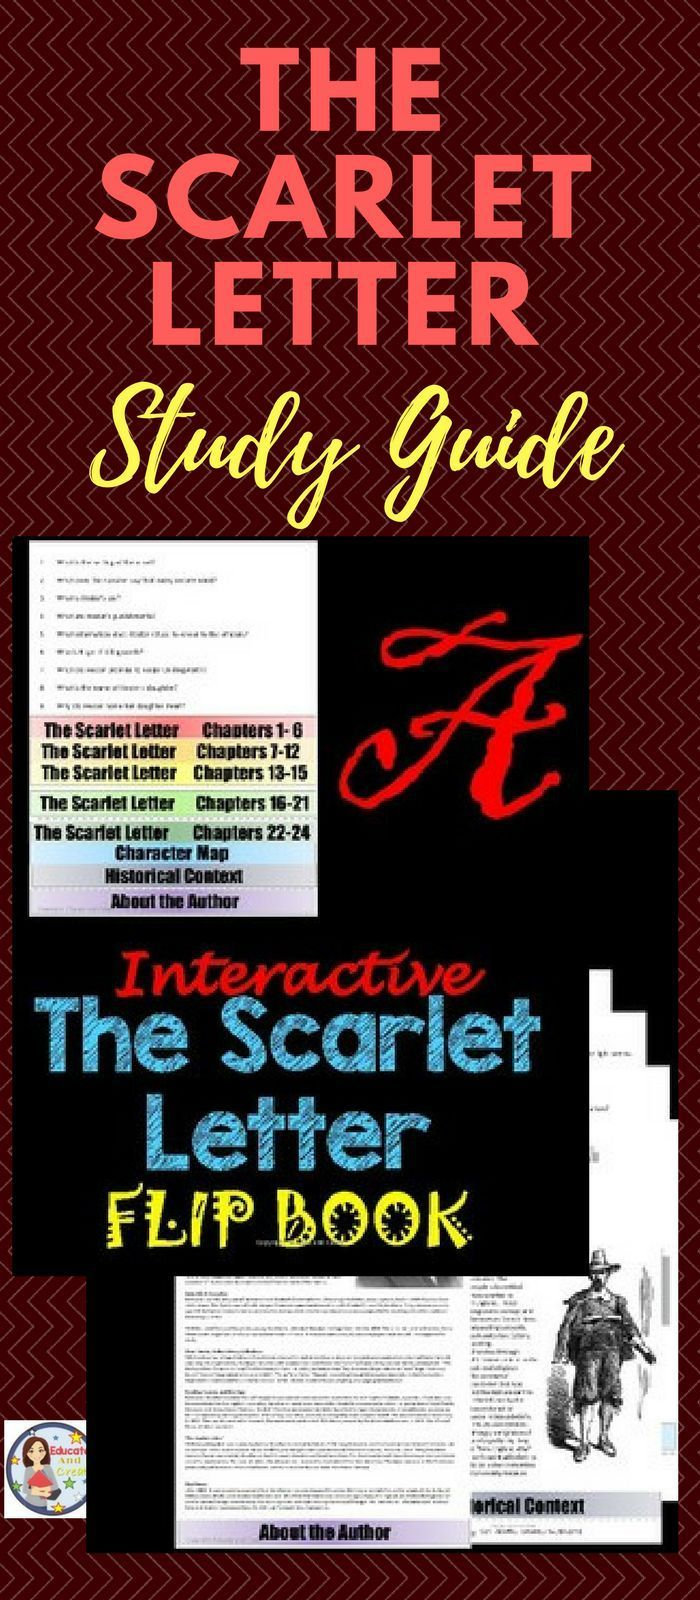 The Scarlet Letter Study Guide Flip Book Ellesl With Wild Child